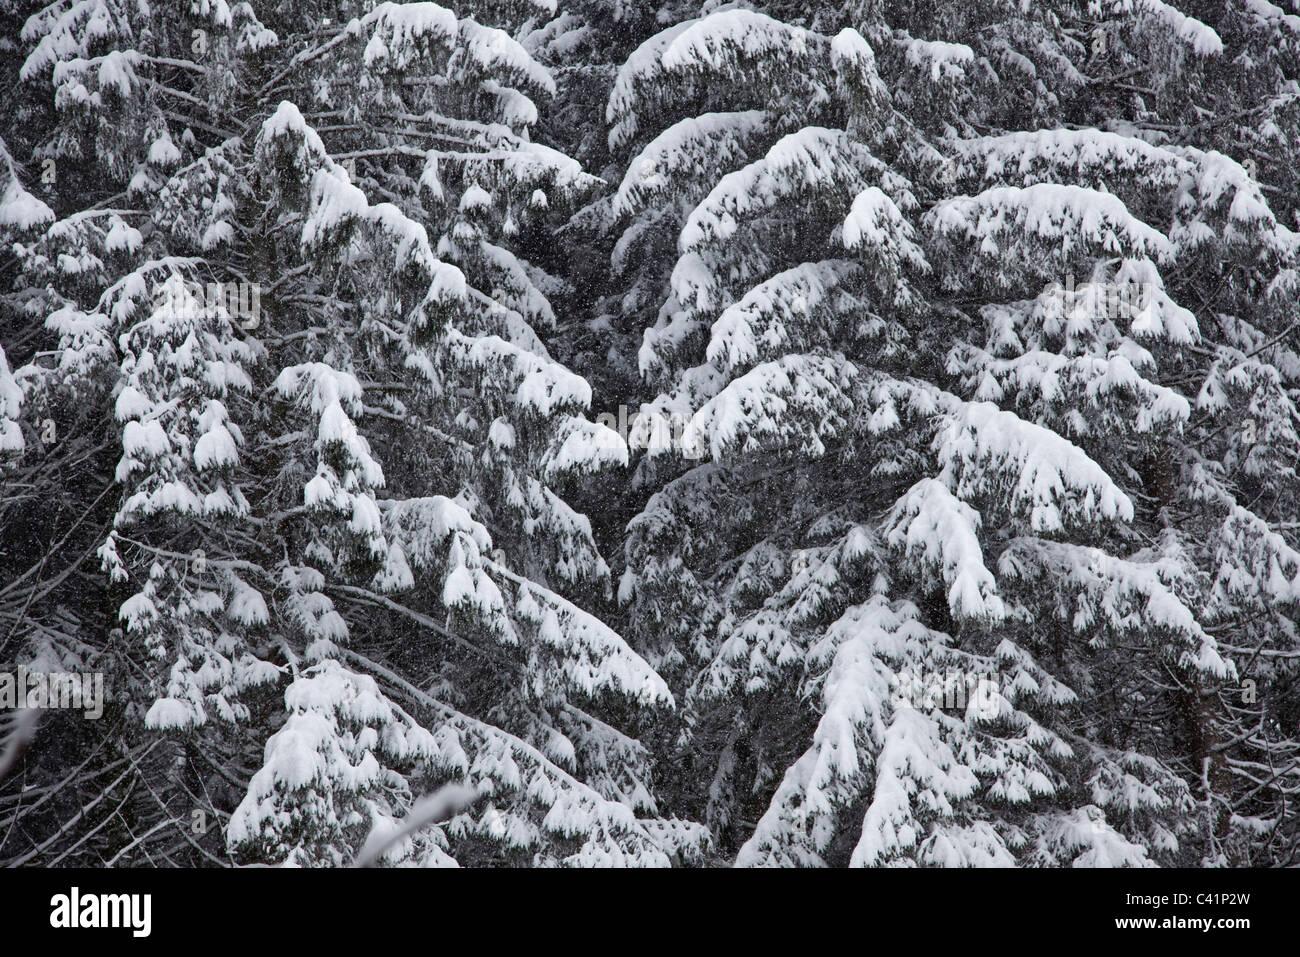 Verschneite Wälder, beschnitten, full frame Stockbild